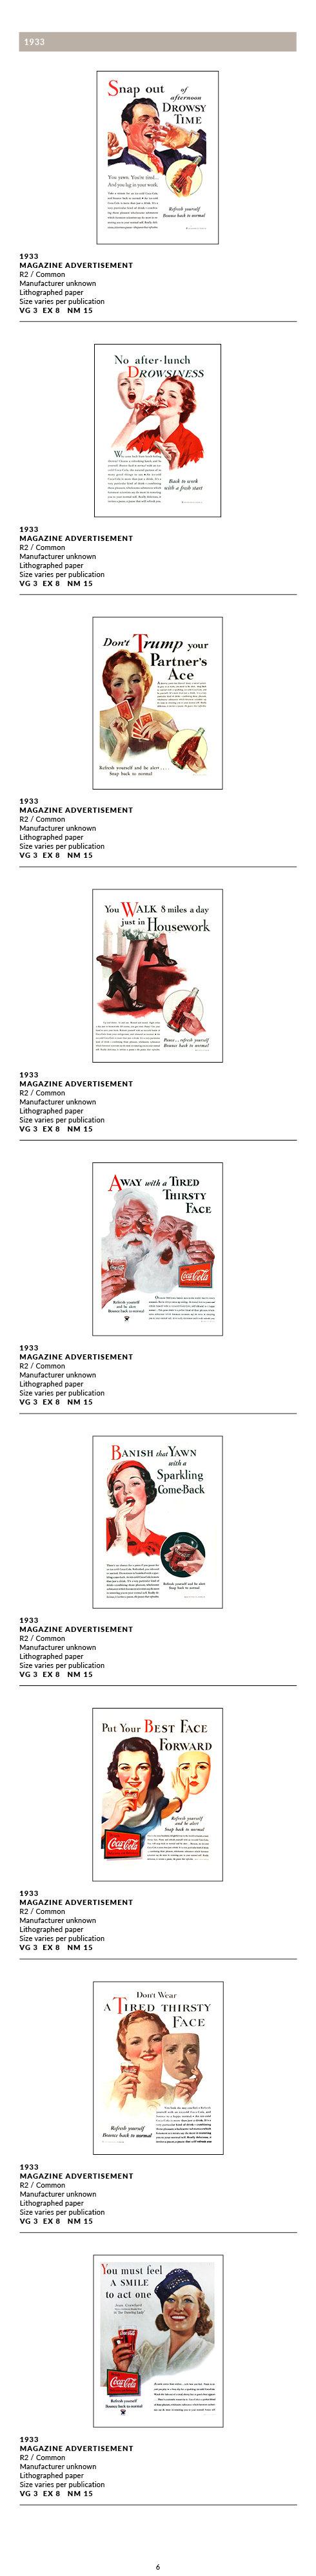 1930-34 Ads6.jpg